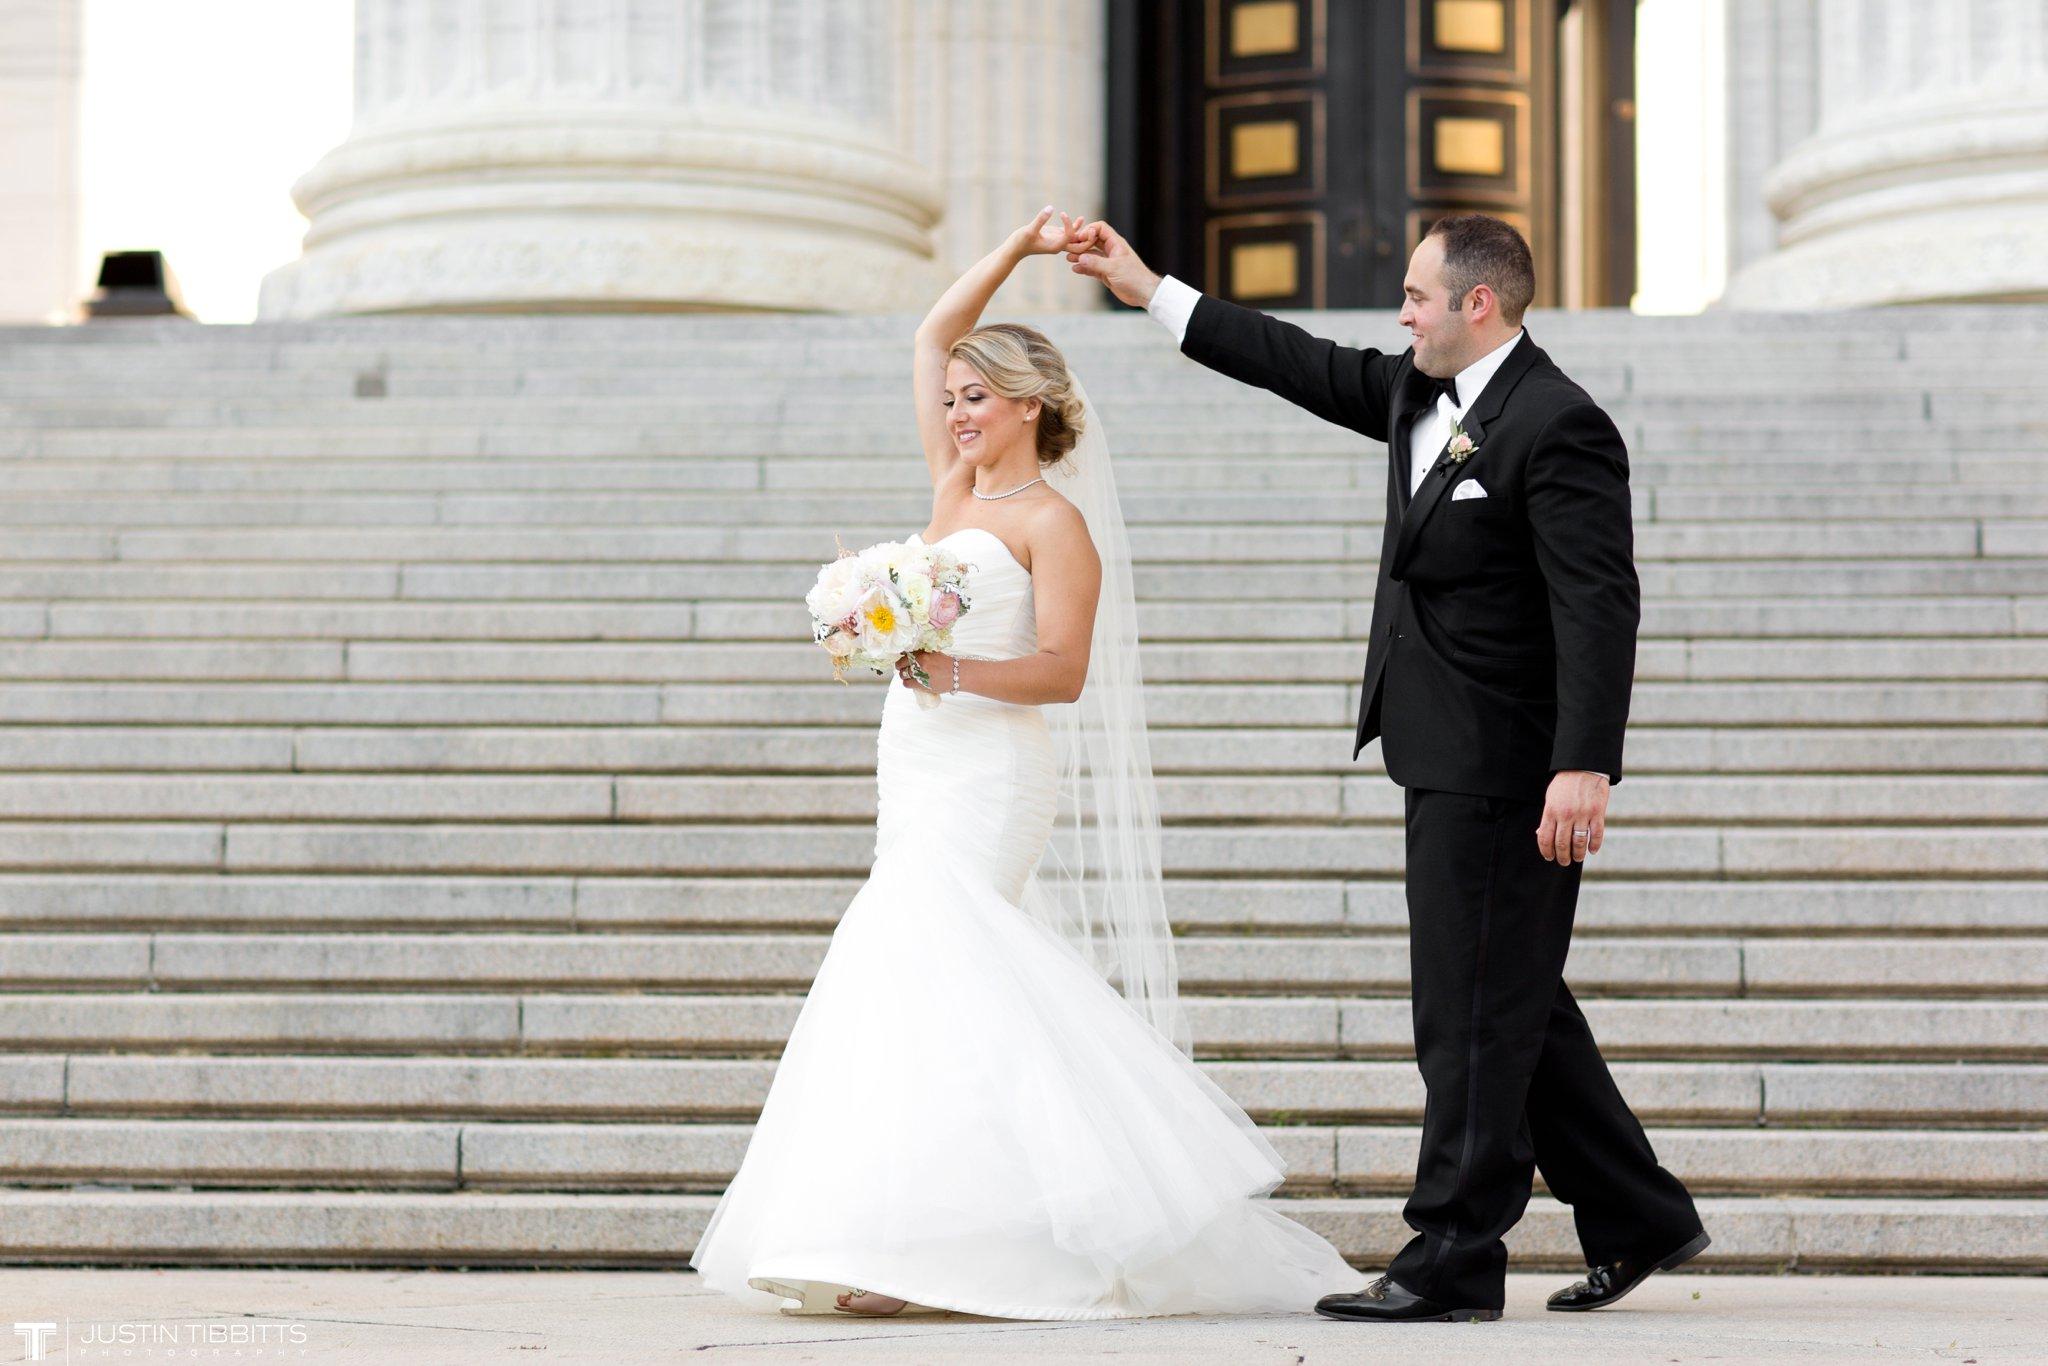 state-room-wedding-photos-with-amanda-and-nick_0137